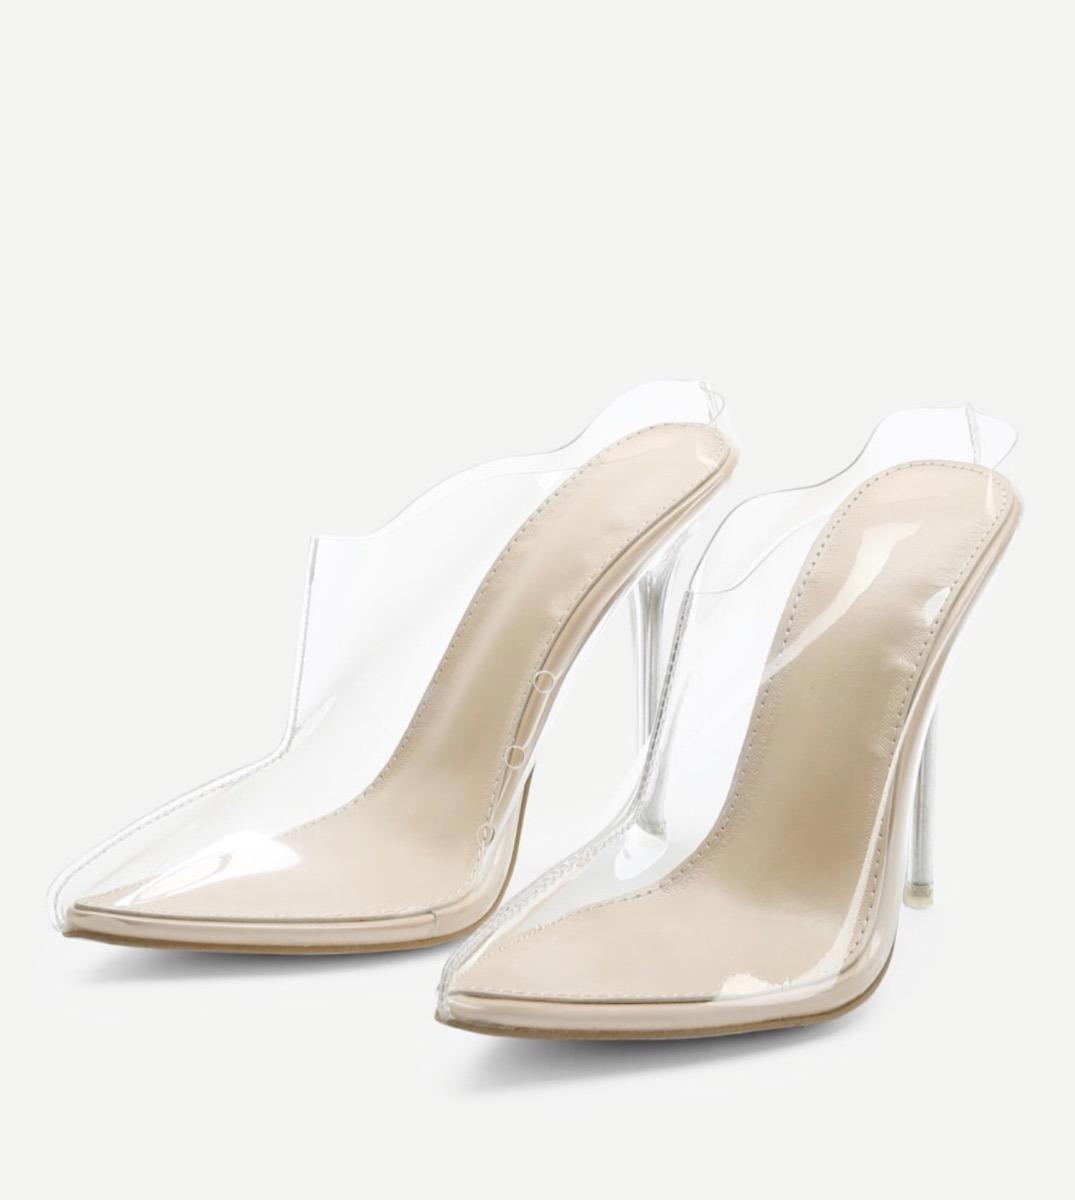 Zapatos Kardashian Transparentes Tacon Kylie Moda Kim Y De ARj345L